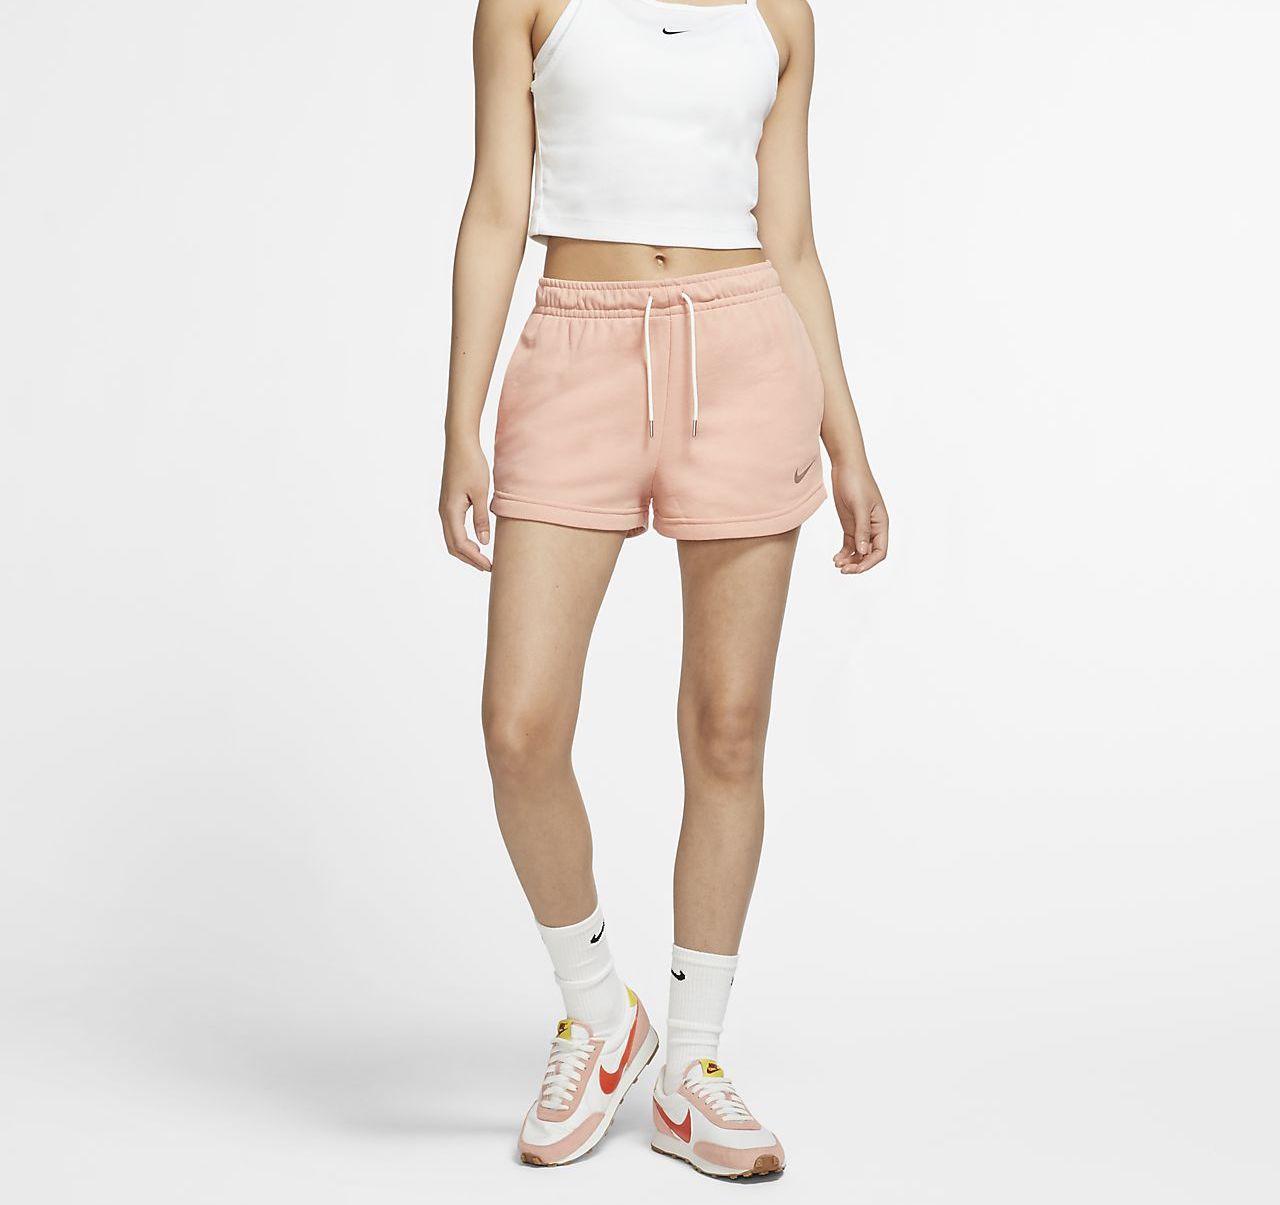 Nike Sportswear Shorts Pink Quartz